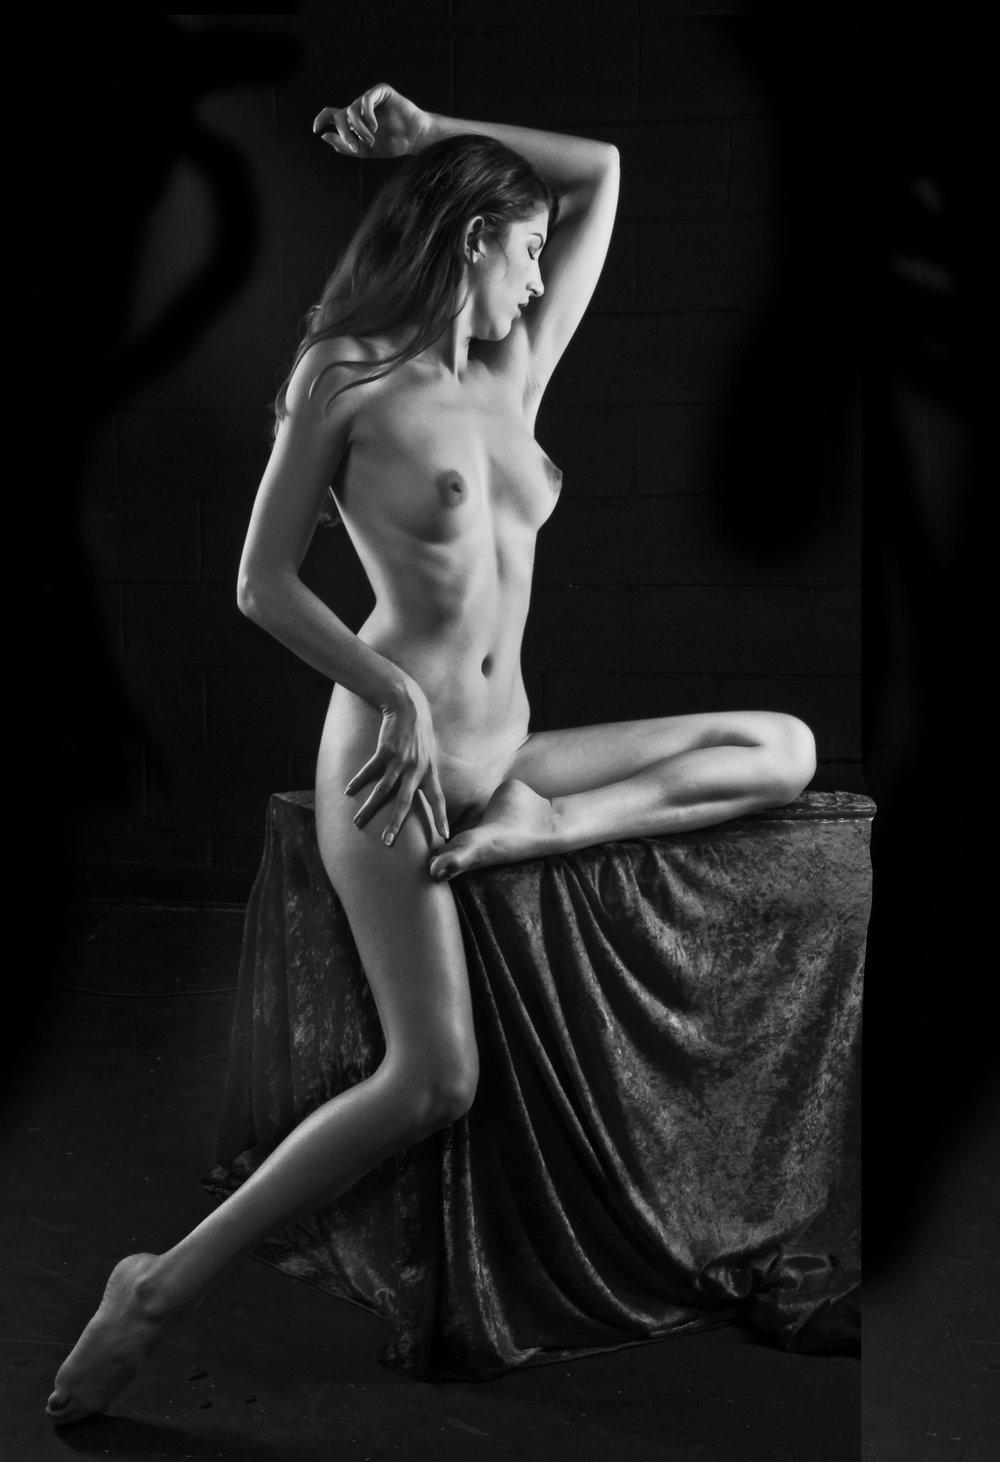 BreannaMarie-DavidWhitson-1.jpg